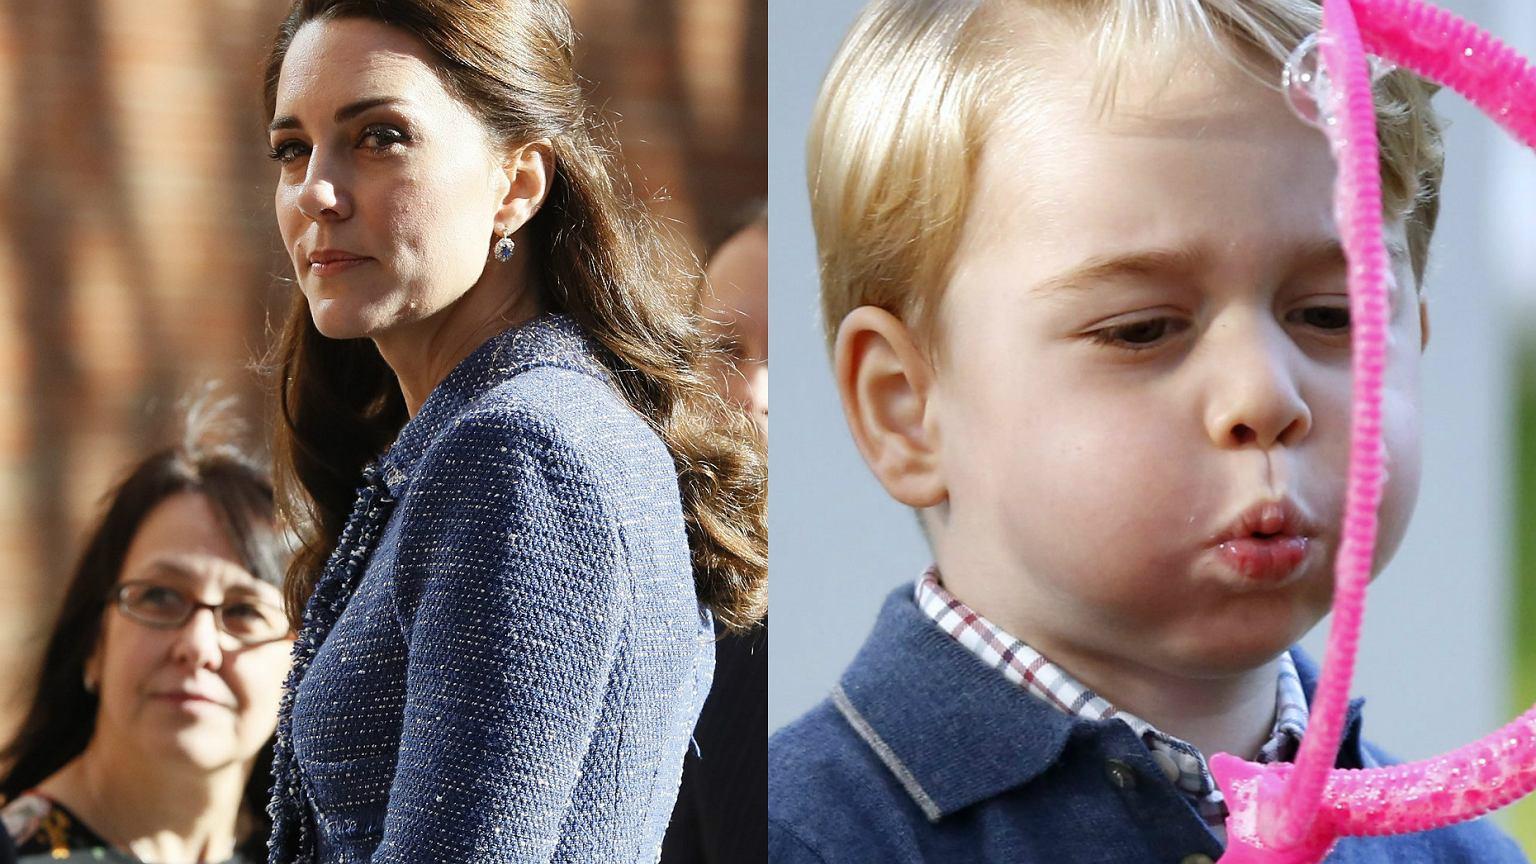 Księżna Kate Ma Spos 243 B Na Ataki Złości Księcia George A I